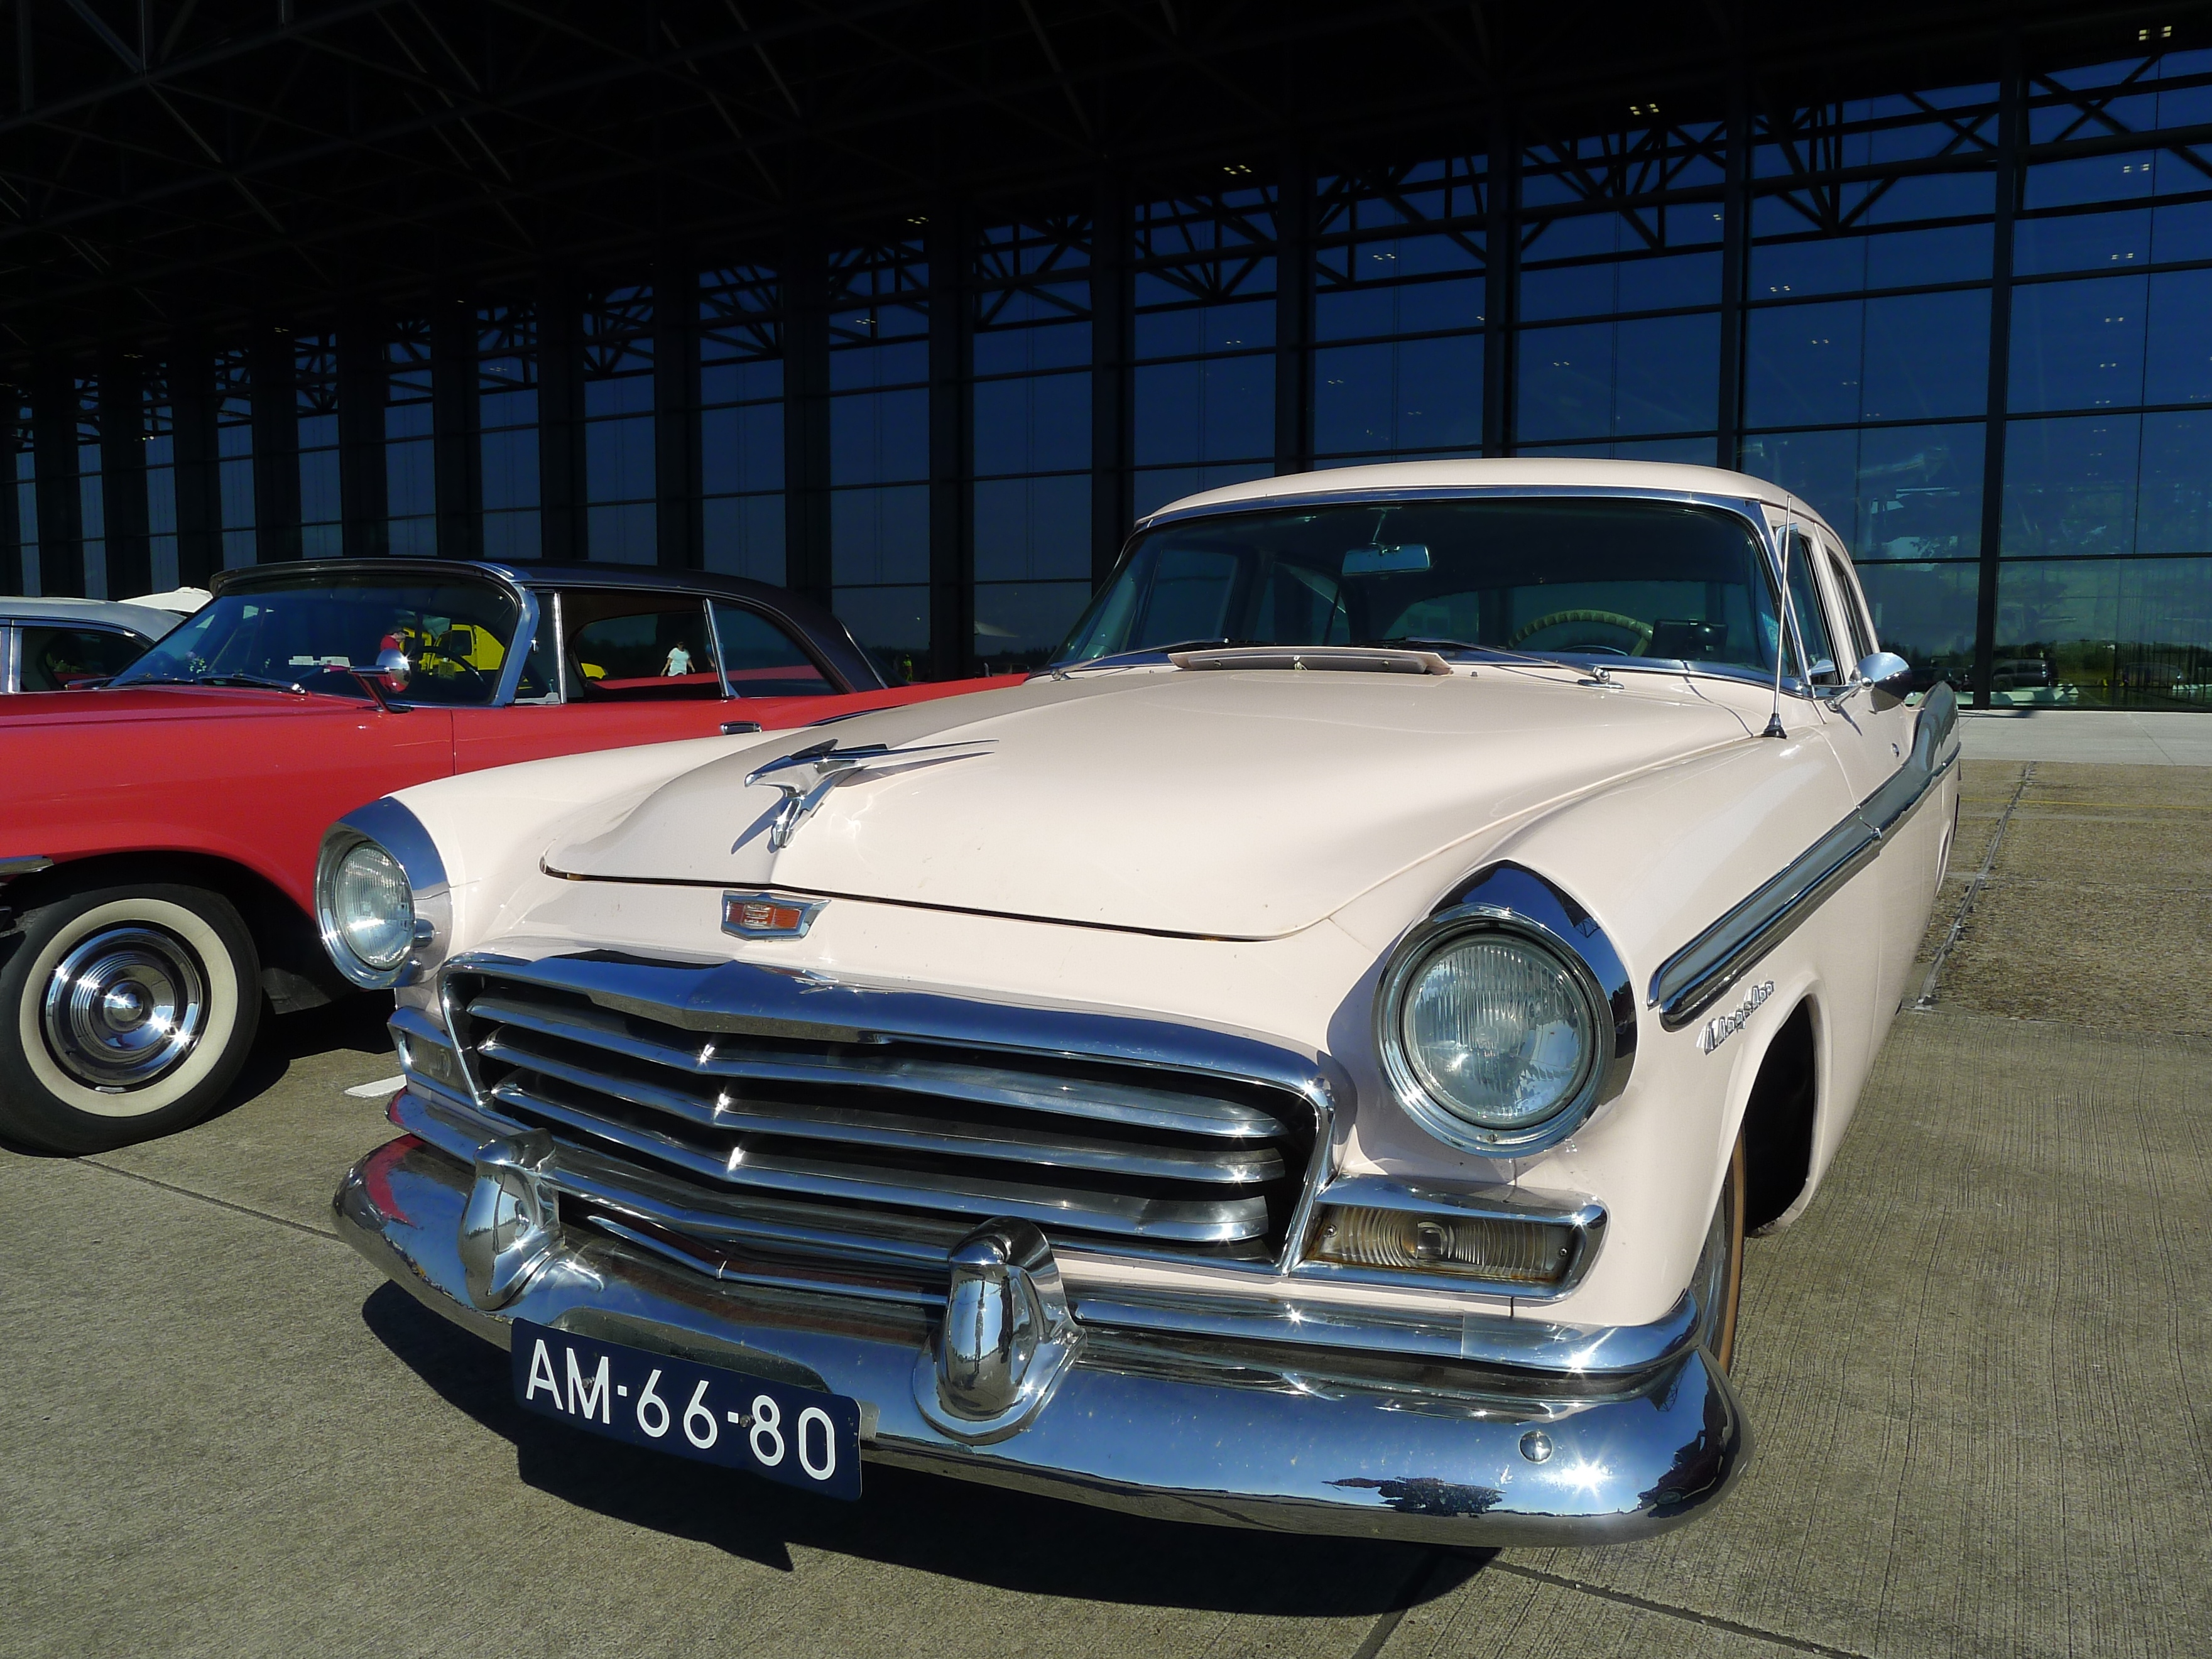 060_Nederland_Soesterberg_Dutch_Chrysler_USA_Classic_Car_Meeting_2016_@_Nationaal_militair_museum